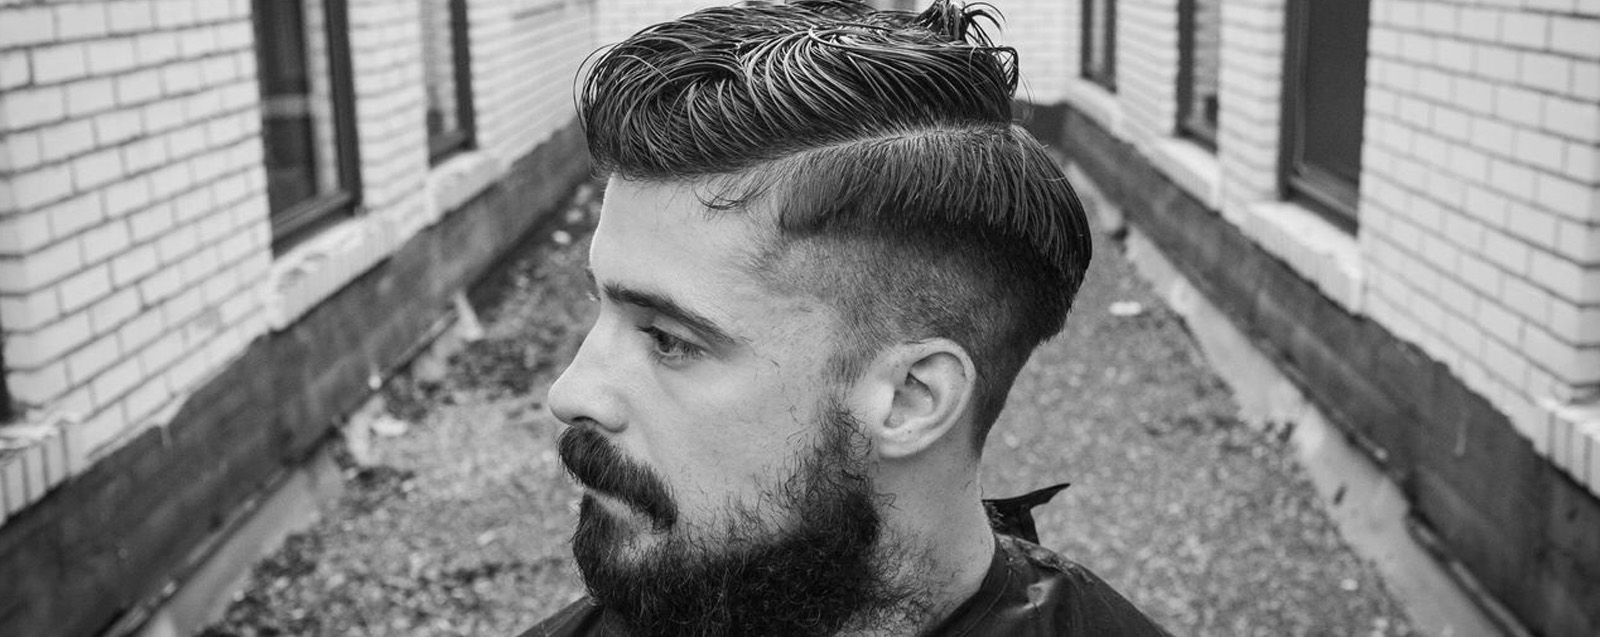 Medium short haircut for men ekol erkek kuaförü bahçeşehir  bahçeşehir erkek kuaförü  pinterest